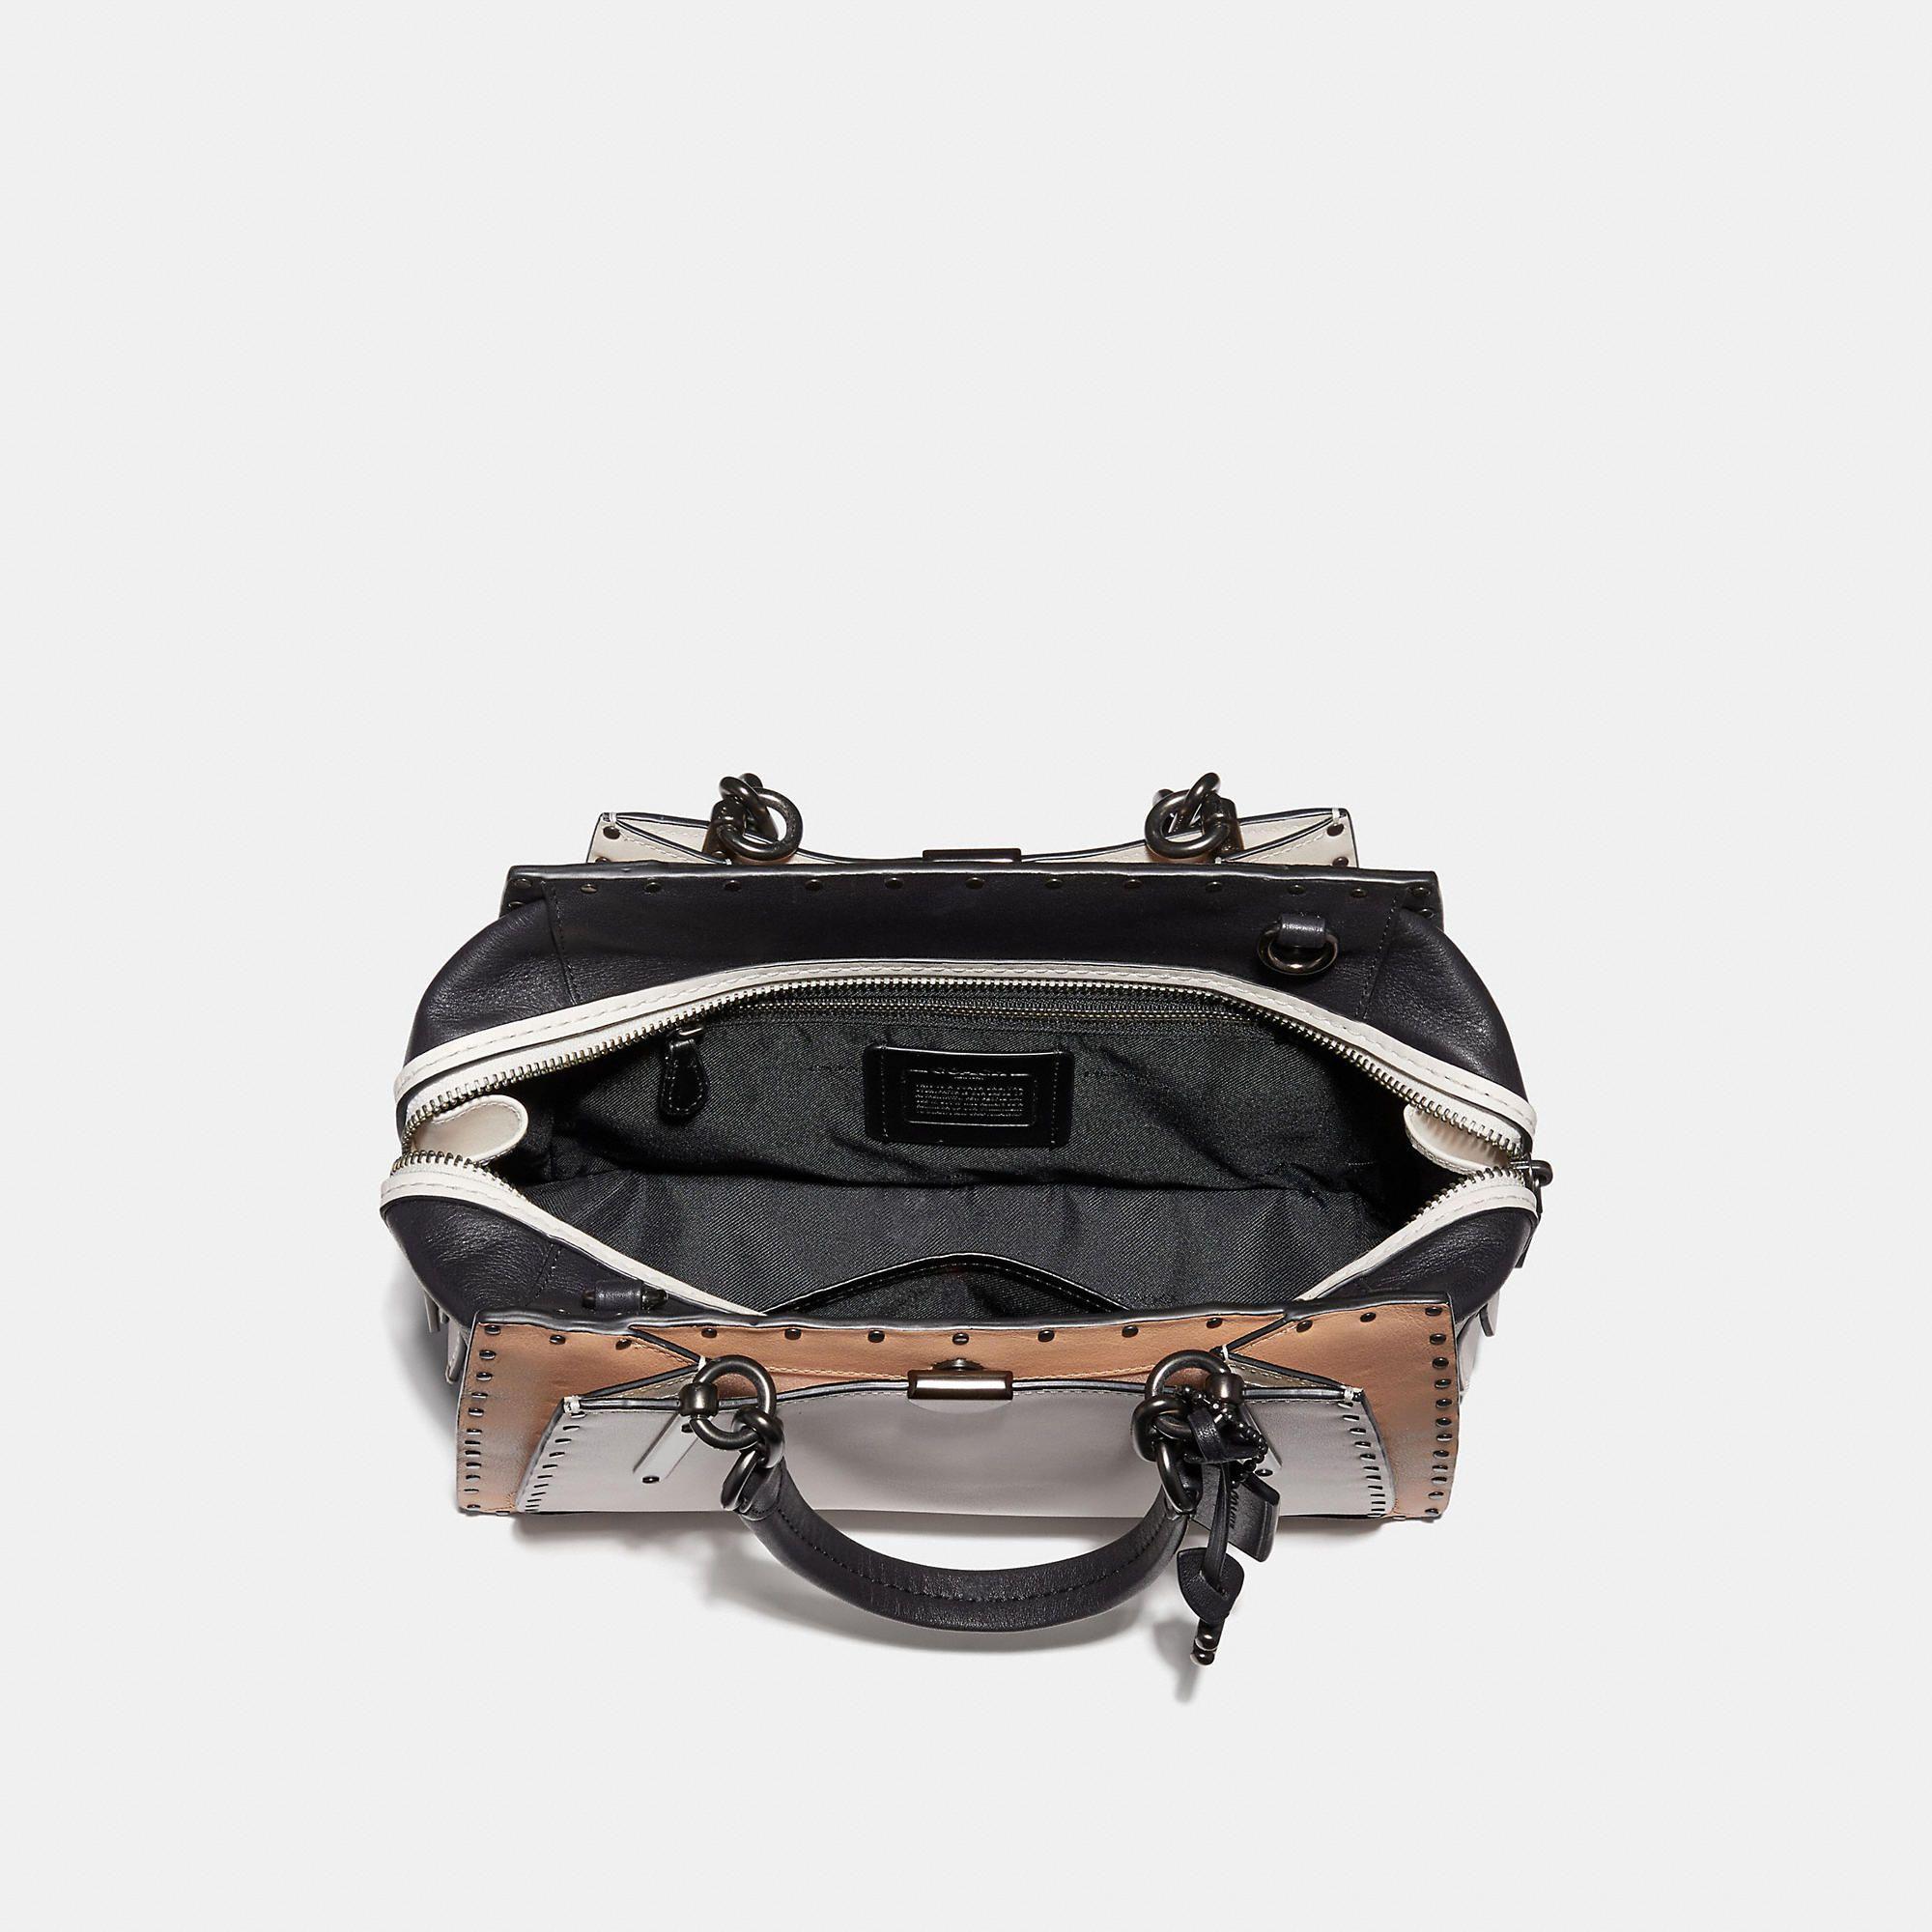 0c14b7af3889 COACH Dreamer With Rivets - Women s Designer Handbags